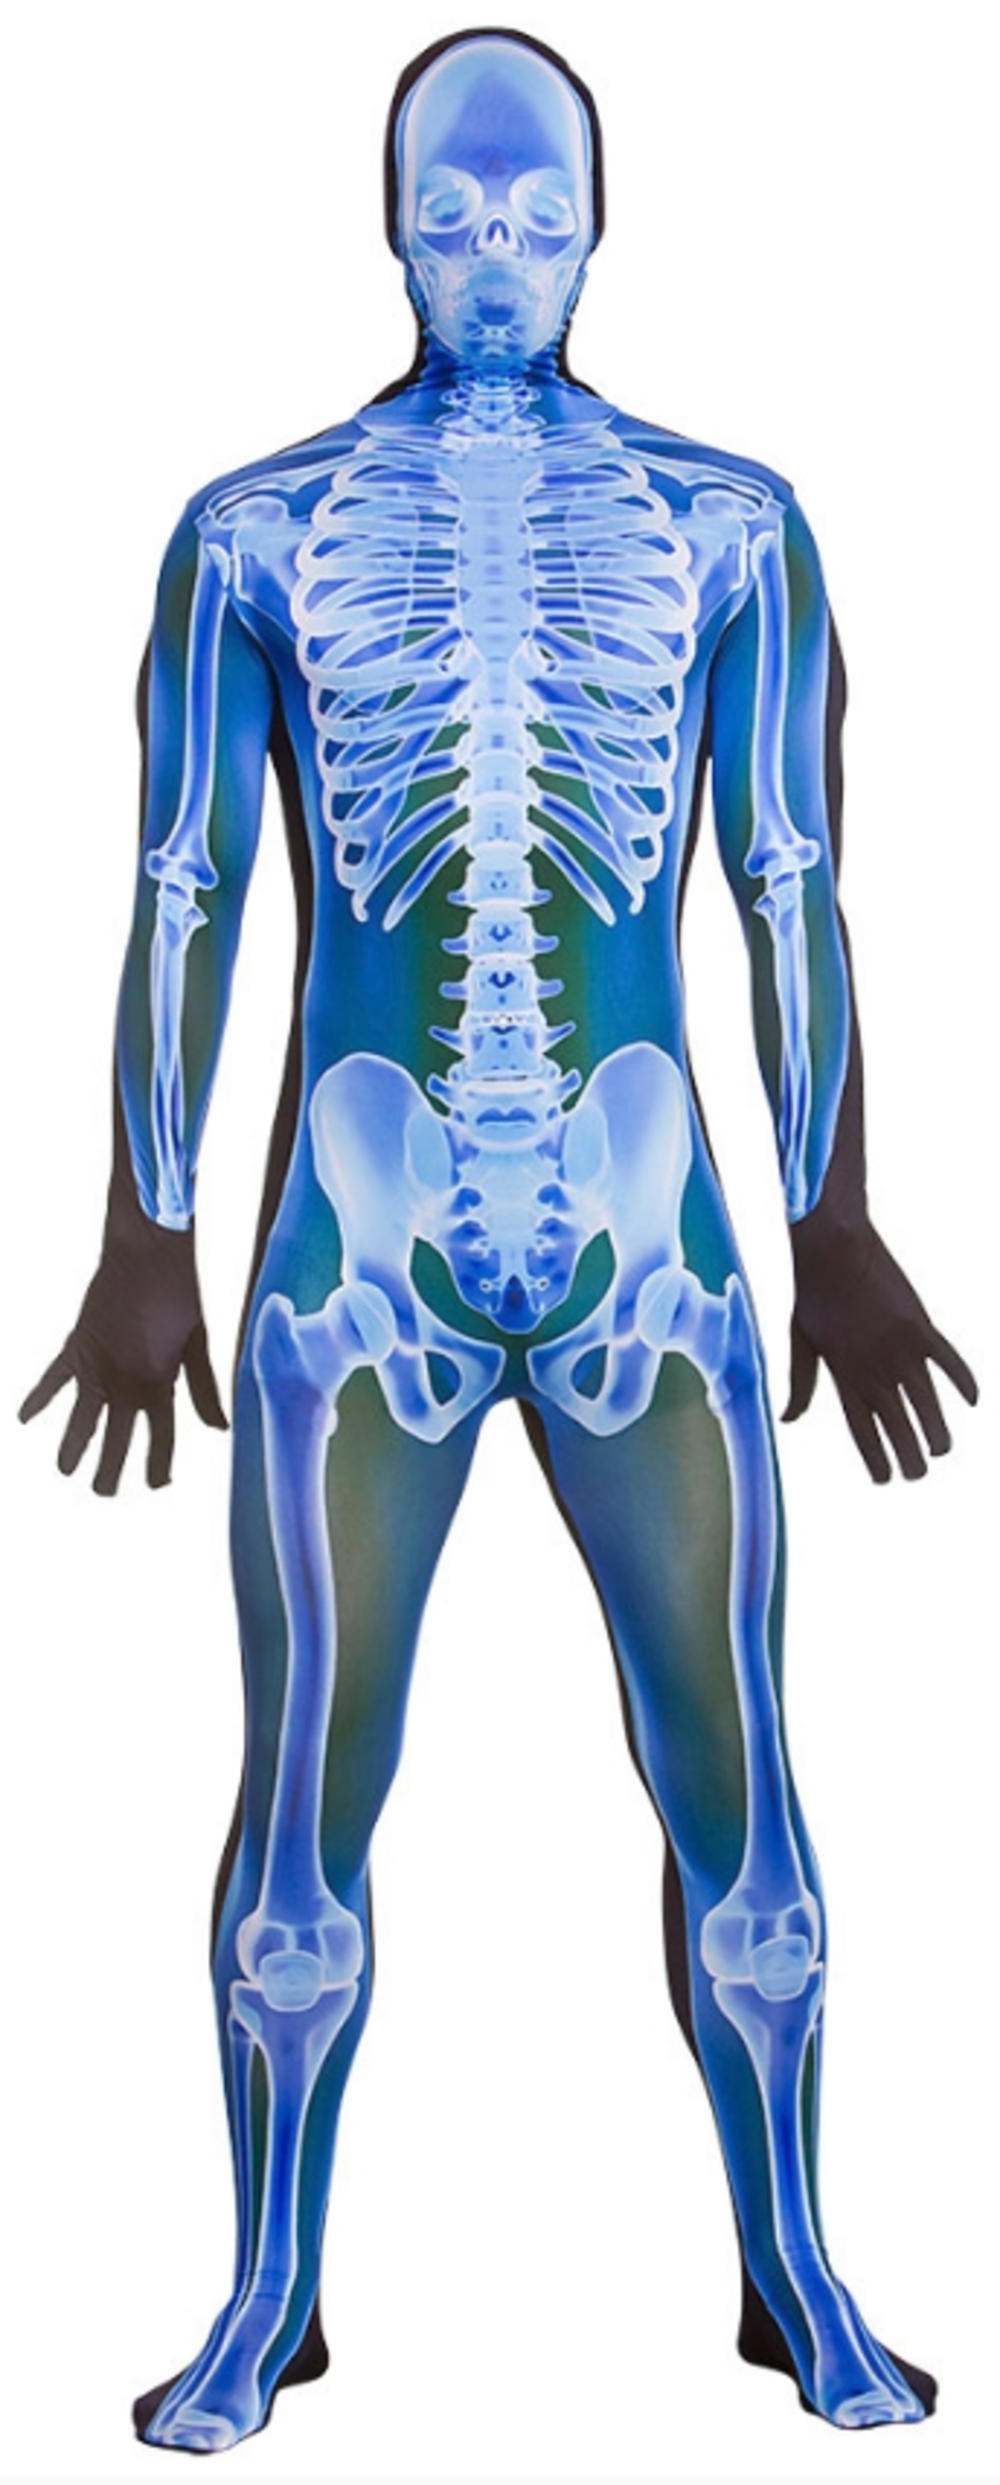 X-Ray Skinz Mens Skeleton Fancy Dress Skull Bodysuit Adults Halloween Costume